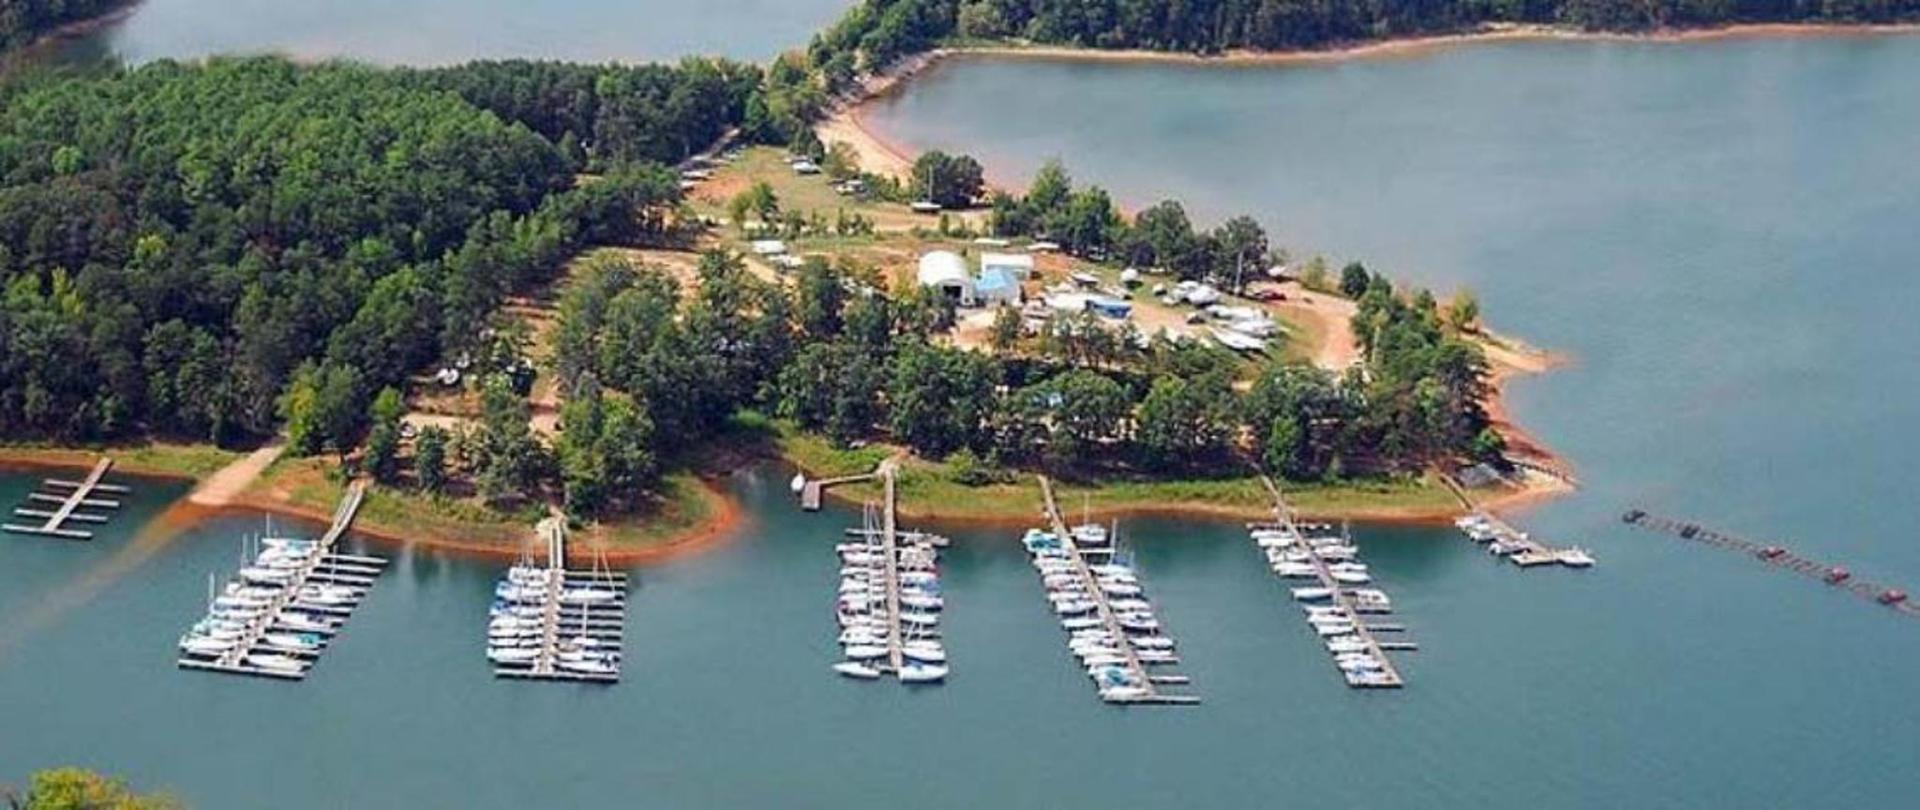 lake-hartwell-marinas-1.jpg.1140x481_default.jpg